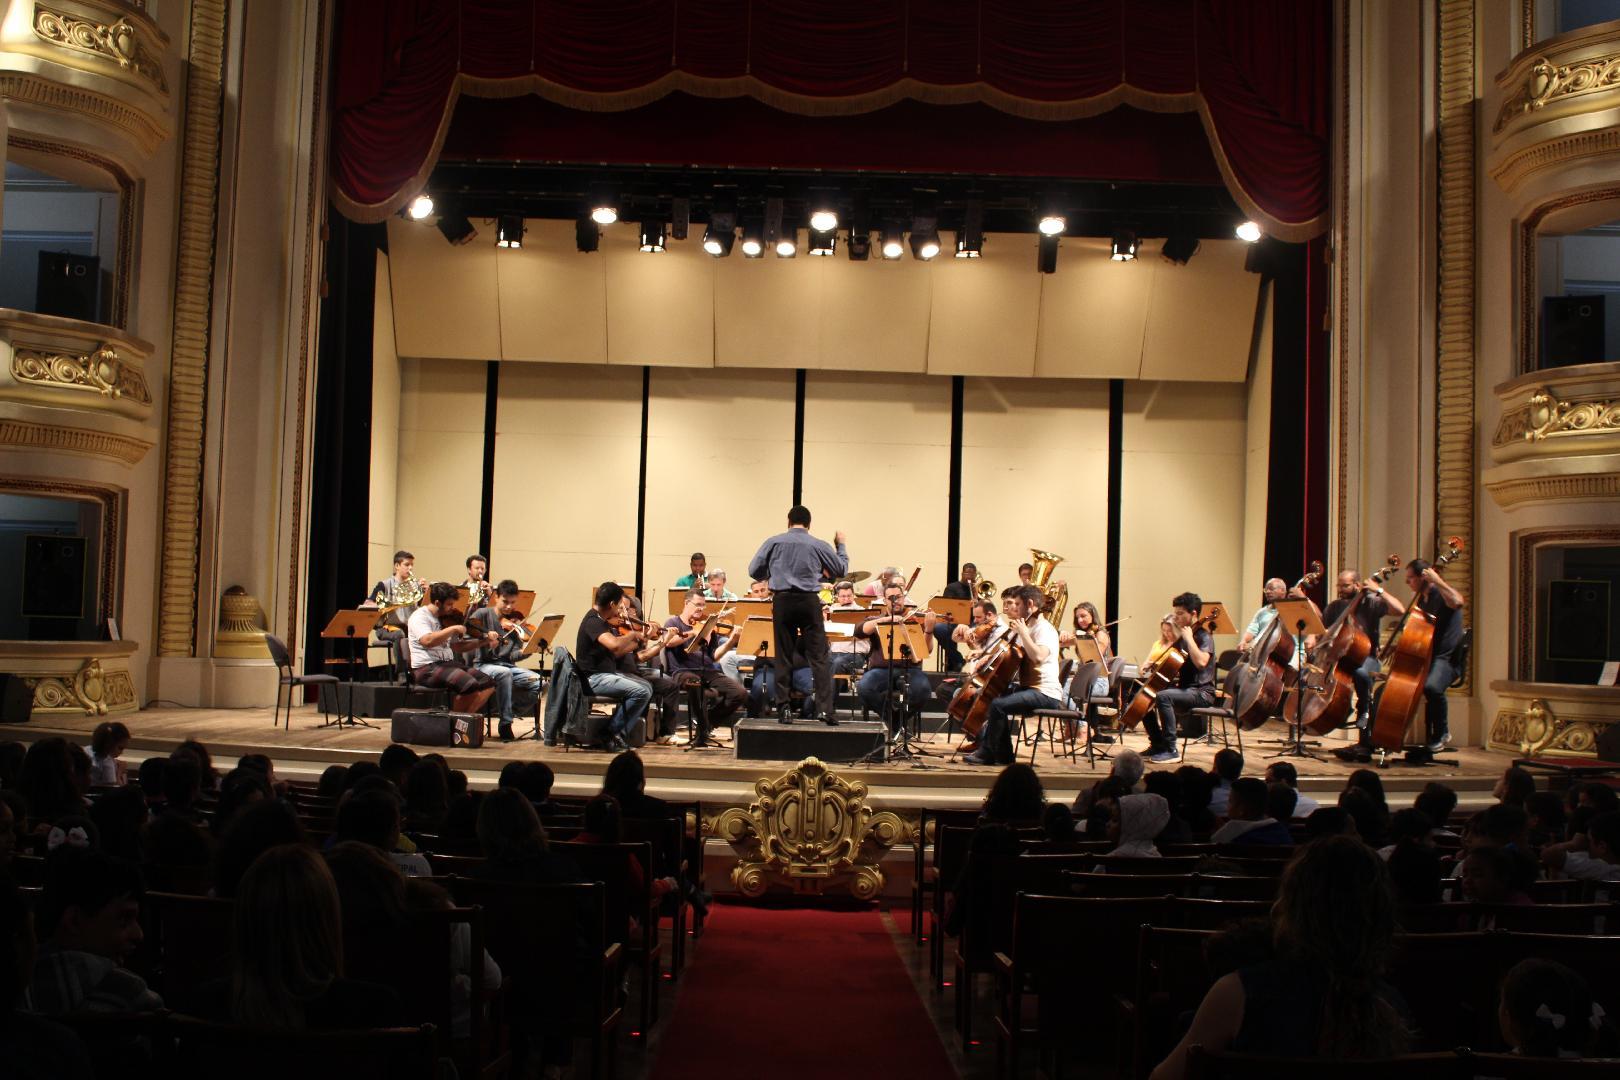 Juventude Tem Concerto acontece neste domingo